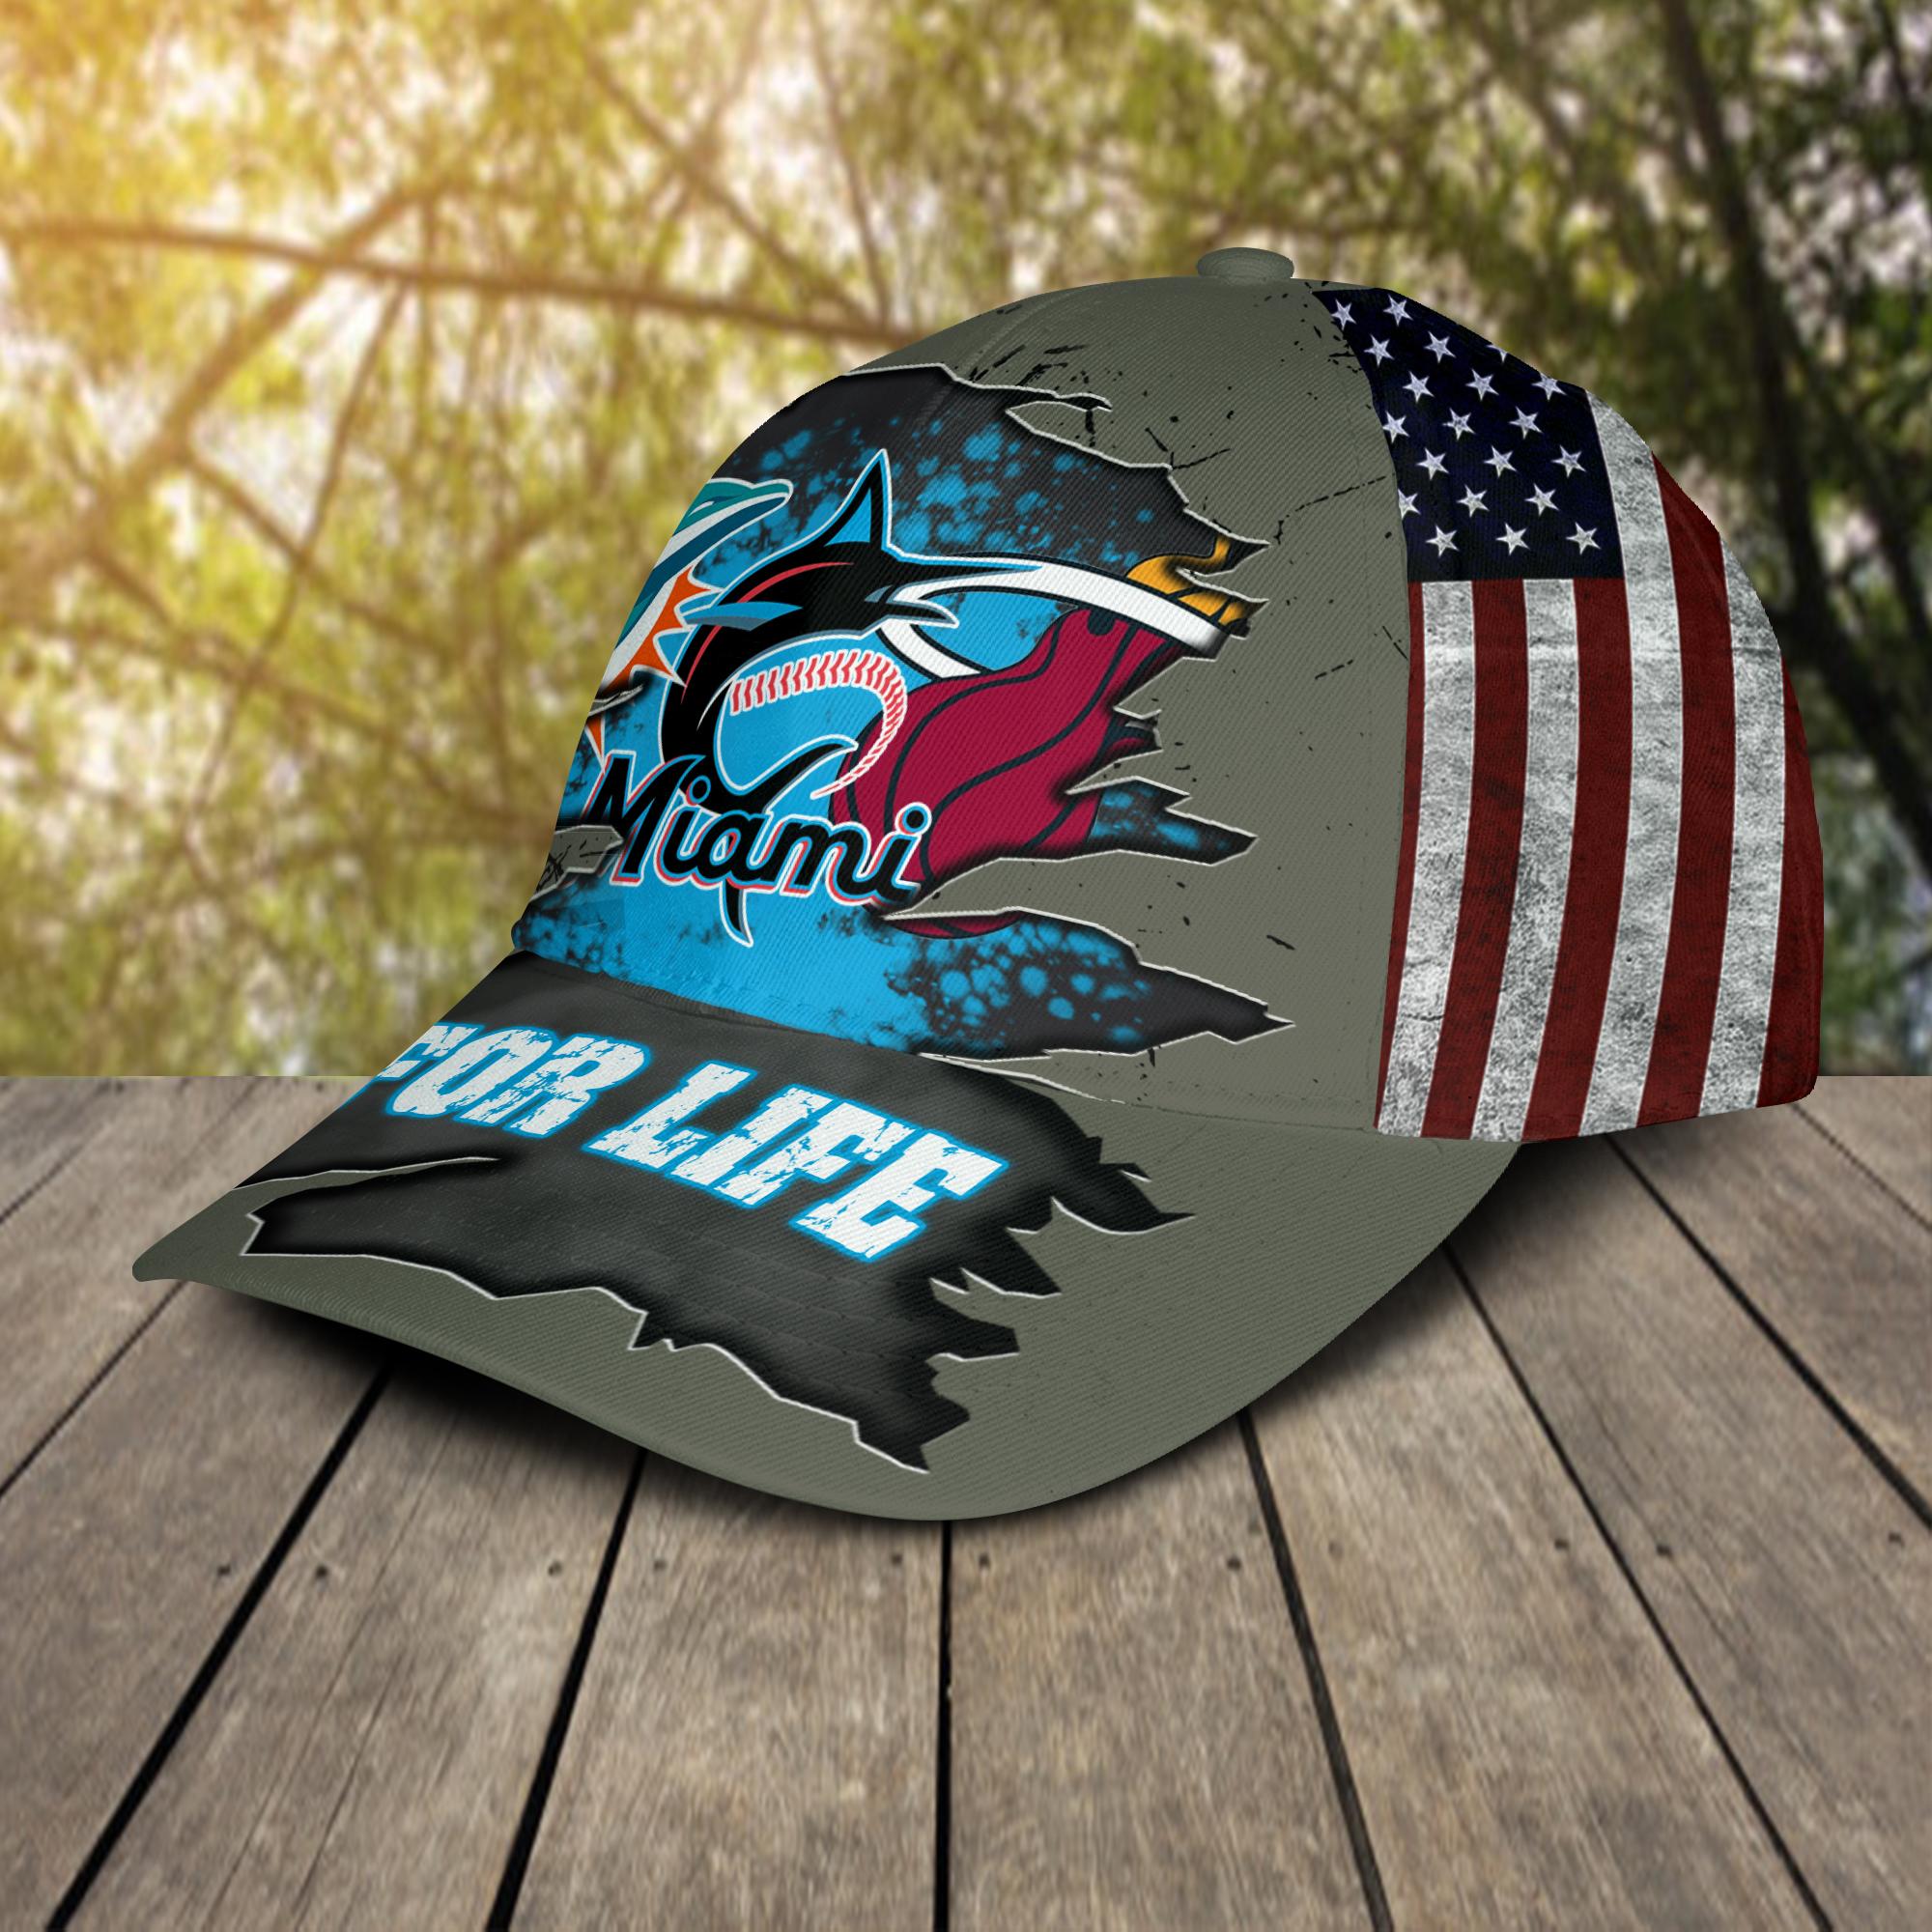 Miami Dolphins, Miami Marlins, Miami Heat For Life Hat Cap -2